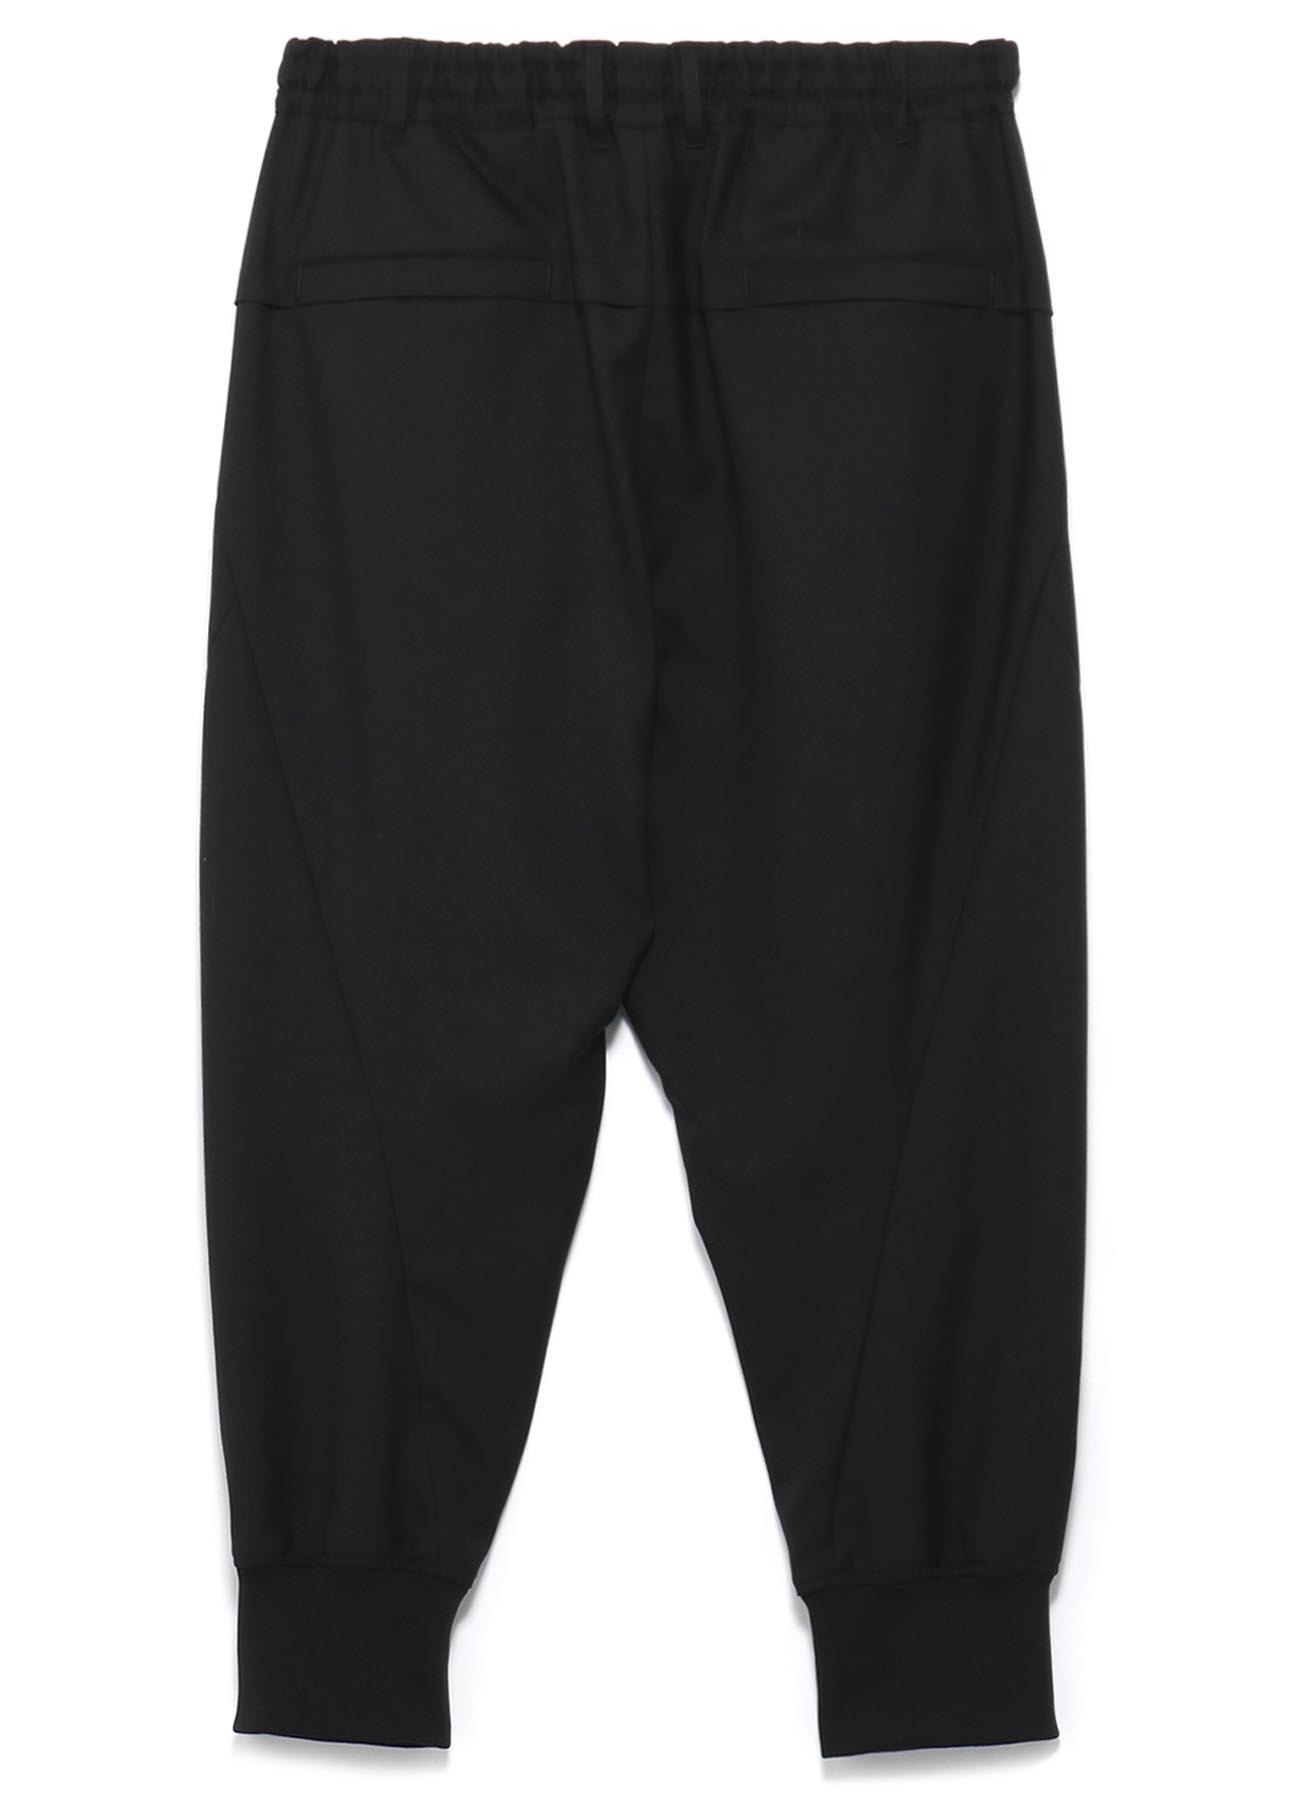 T/W Gabardine Darts Rib Pants